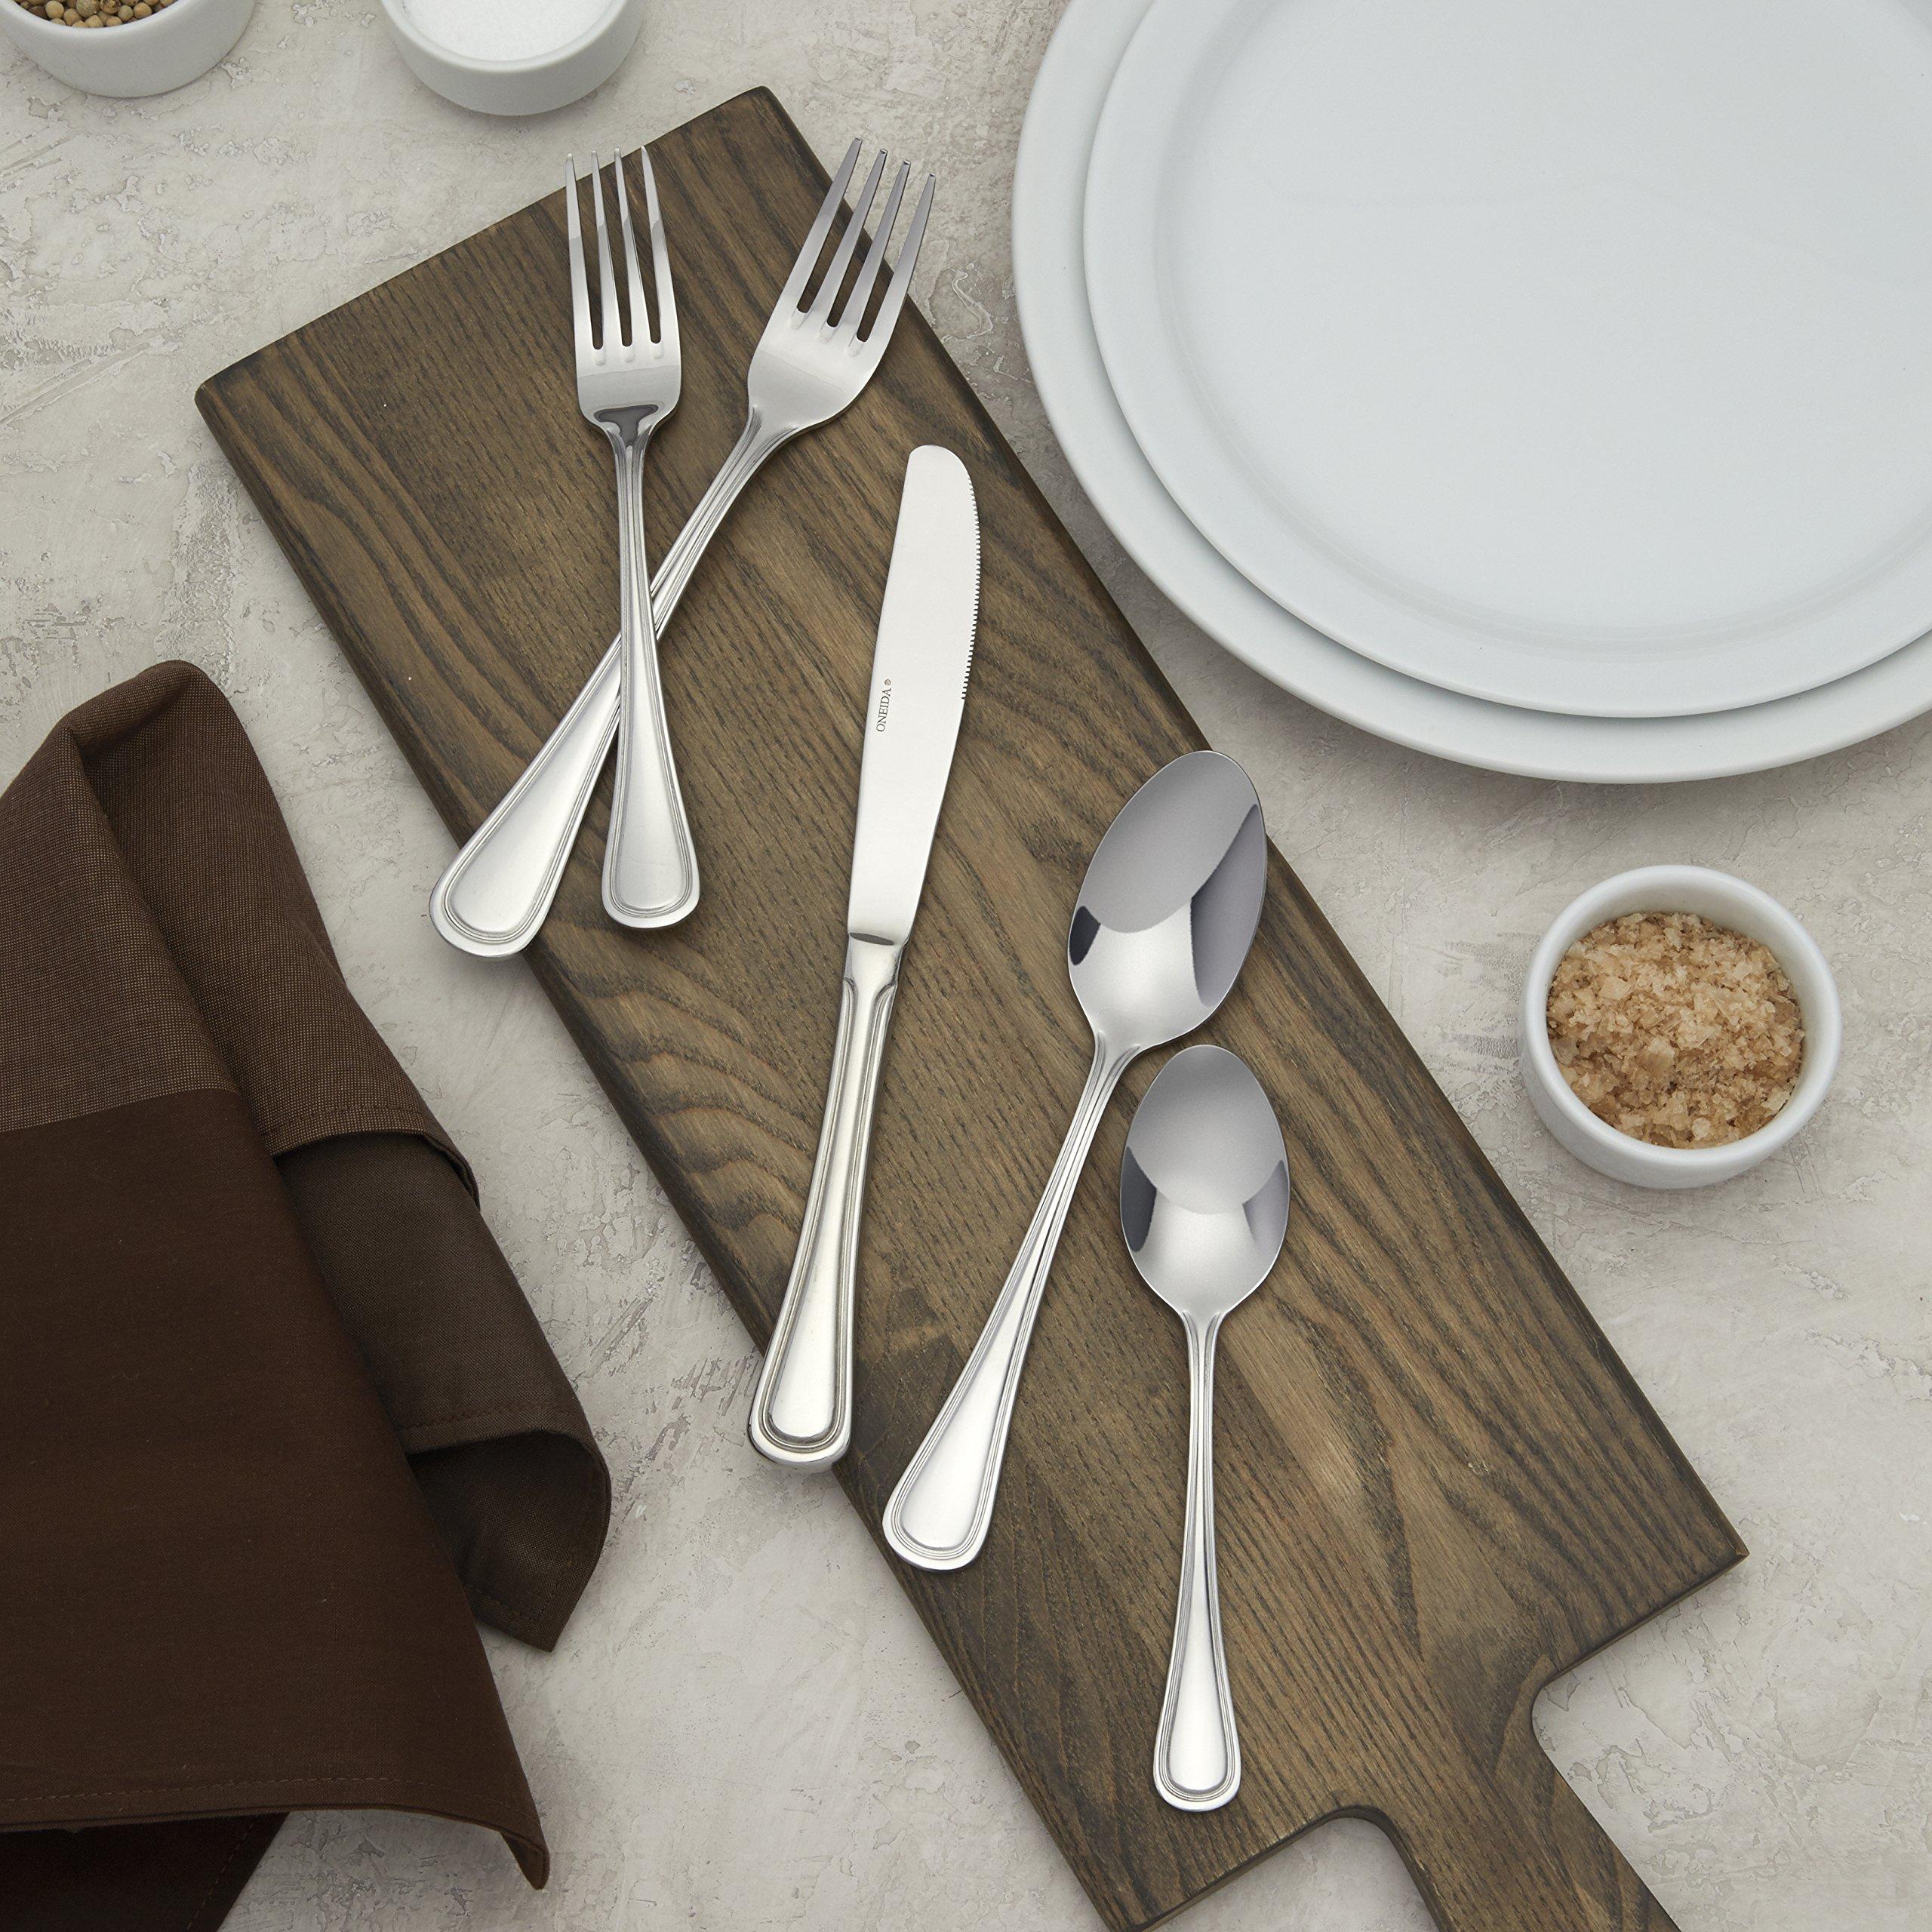 Oneida Foodservice B169SRBF Barcelona Soup Spoons, 18/0 Stainless Steel, Set of 36